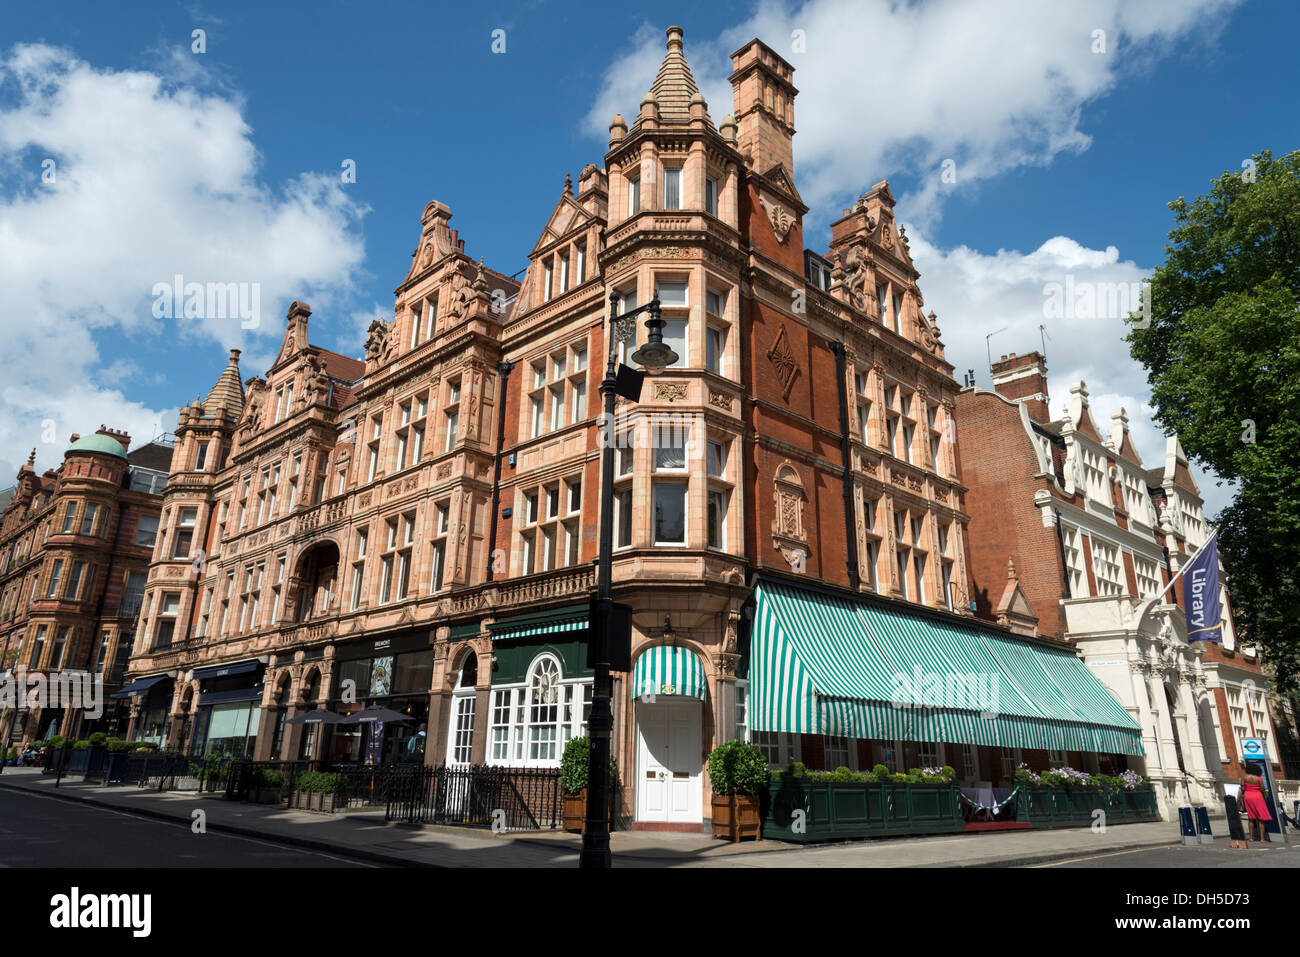 South Audley Street, Mayfair, London, England, UK - Stock Image